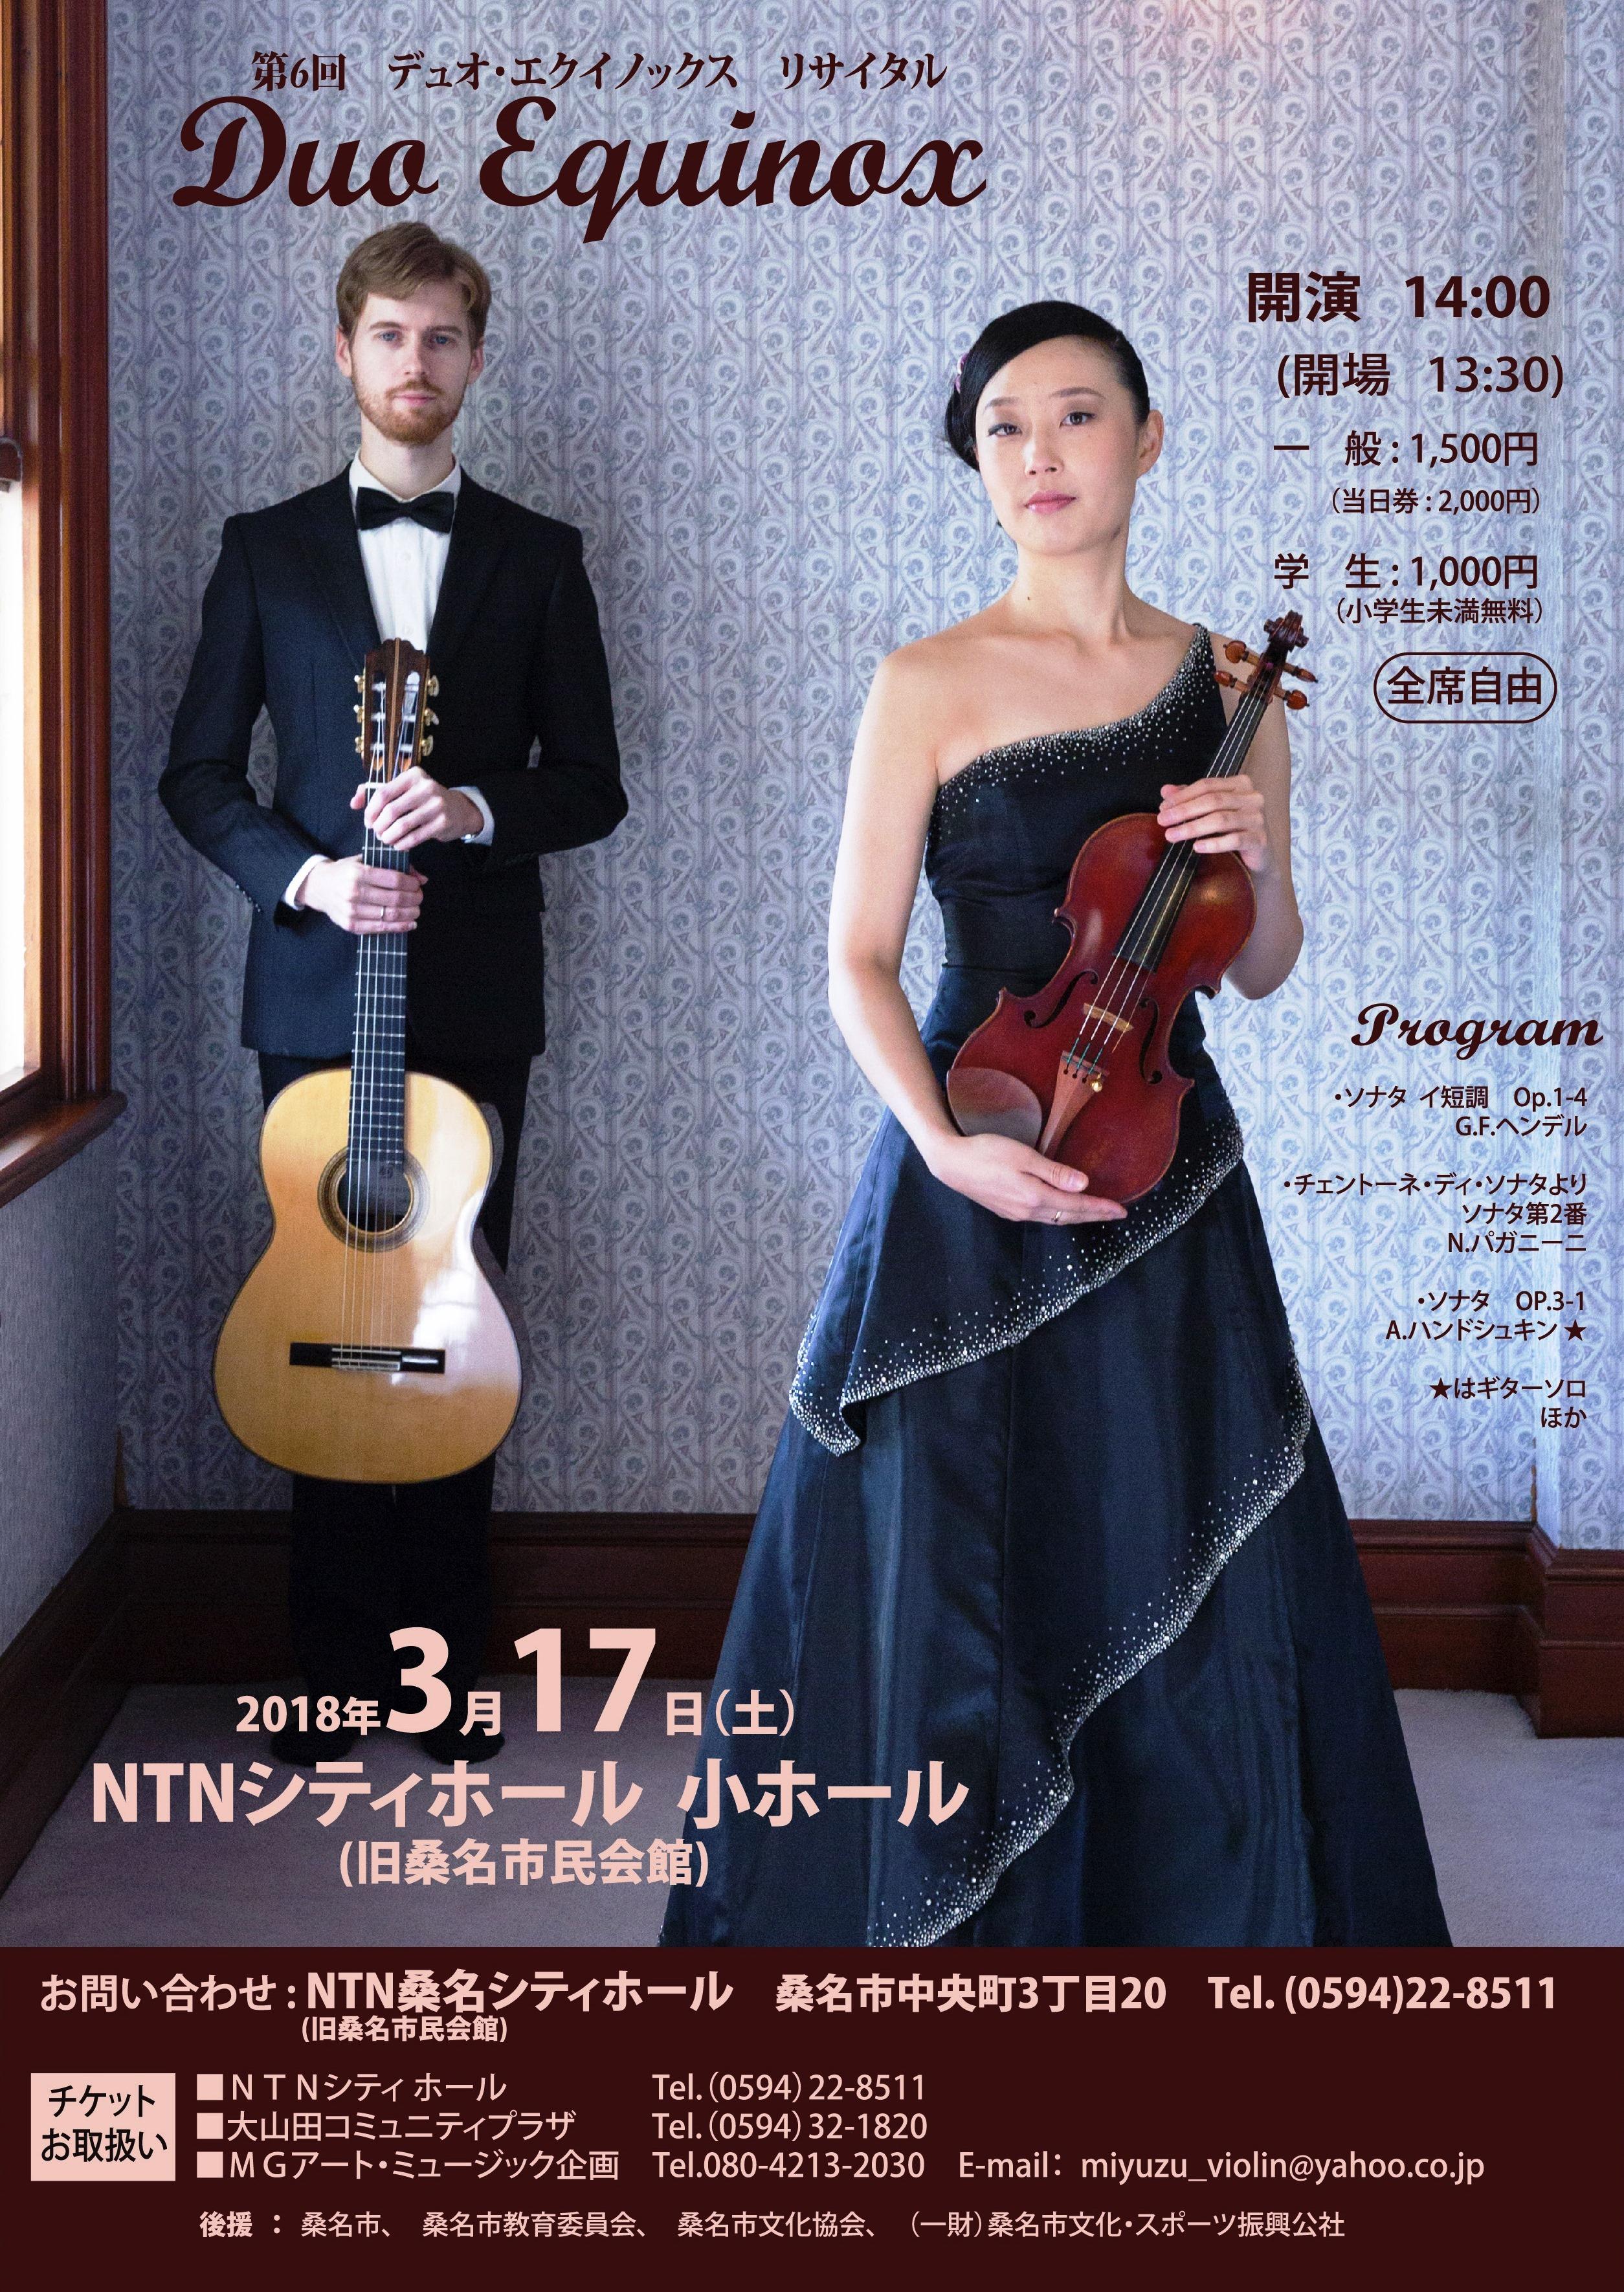 A4 leaflet 2018.3.17akkarui outline.jpg